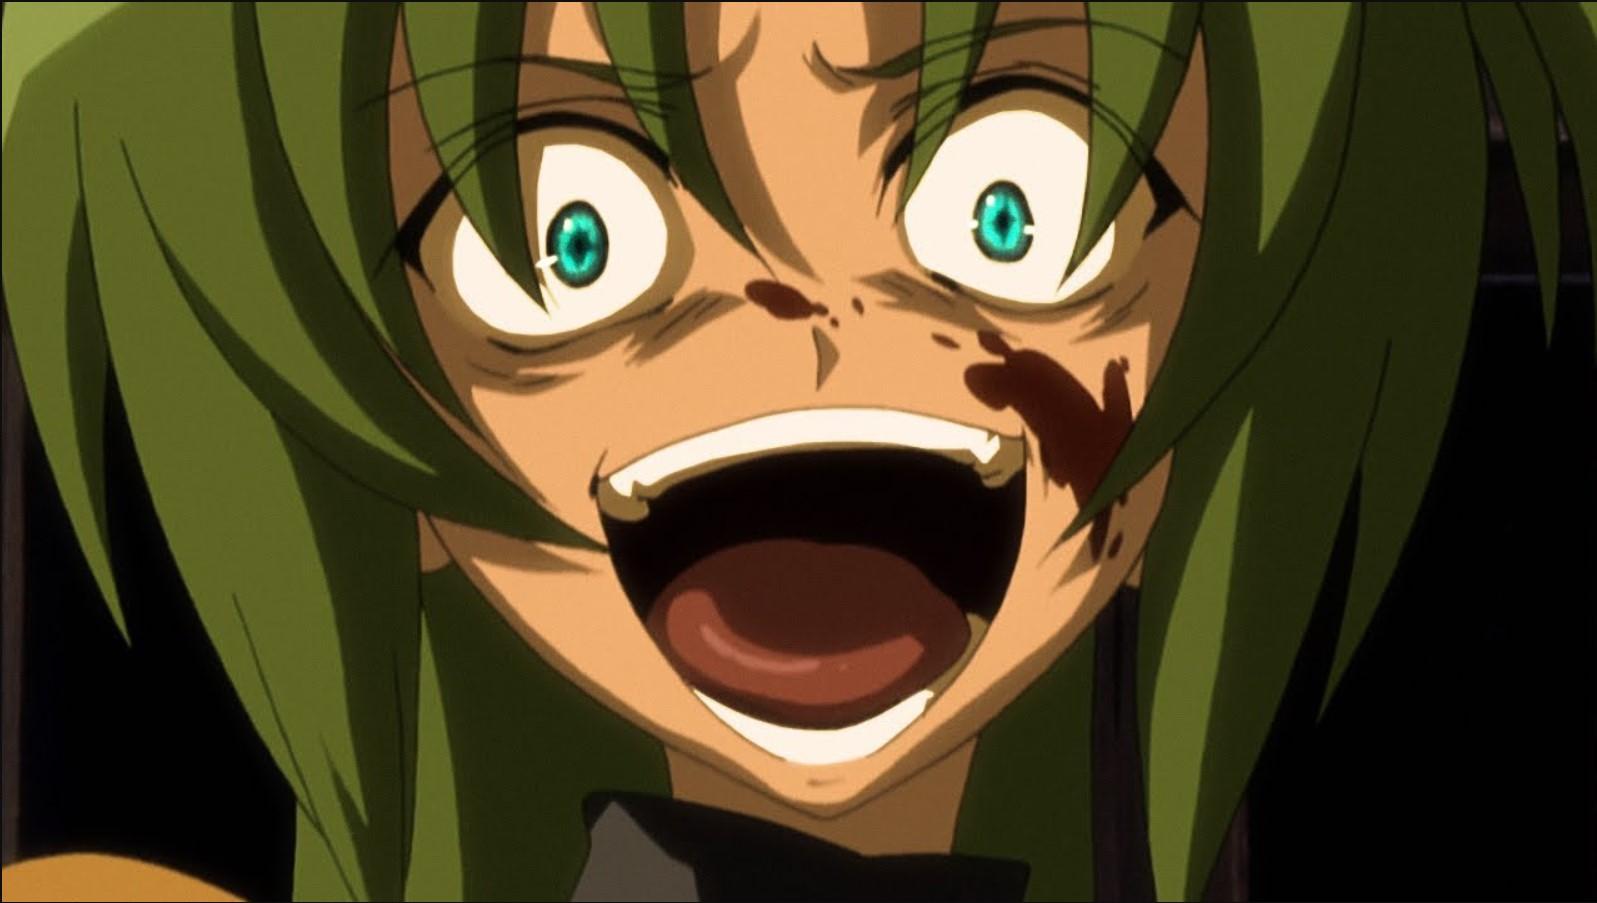 Higurashi Watch Order